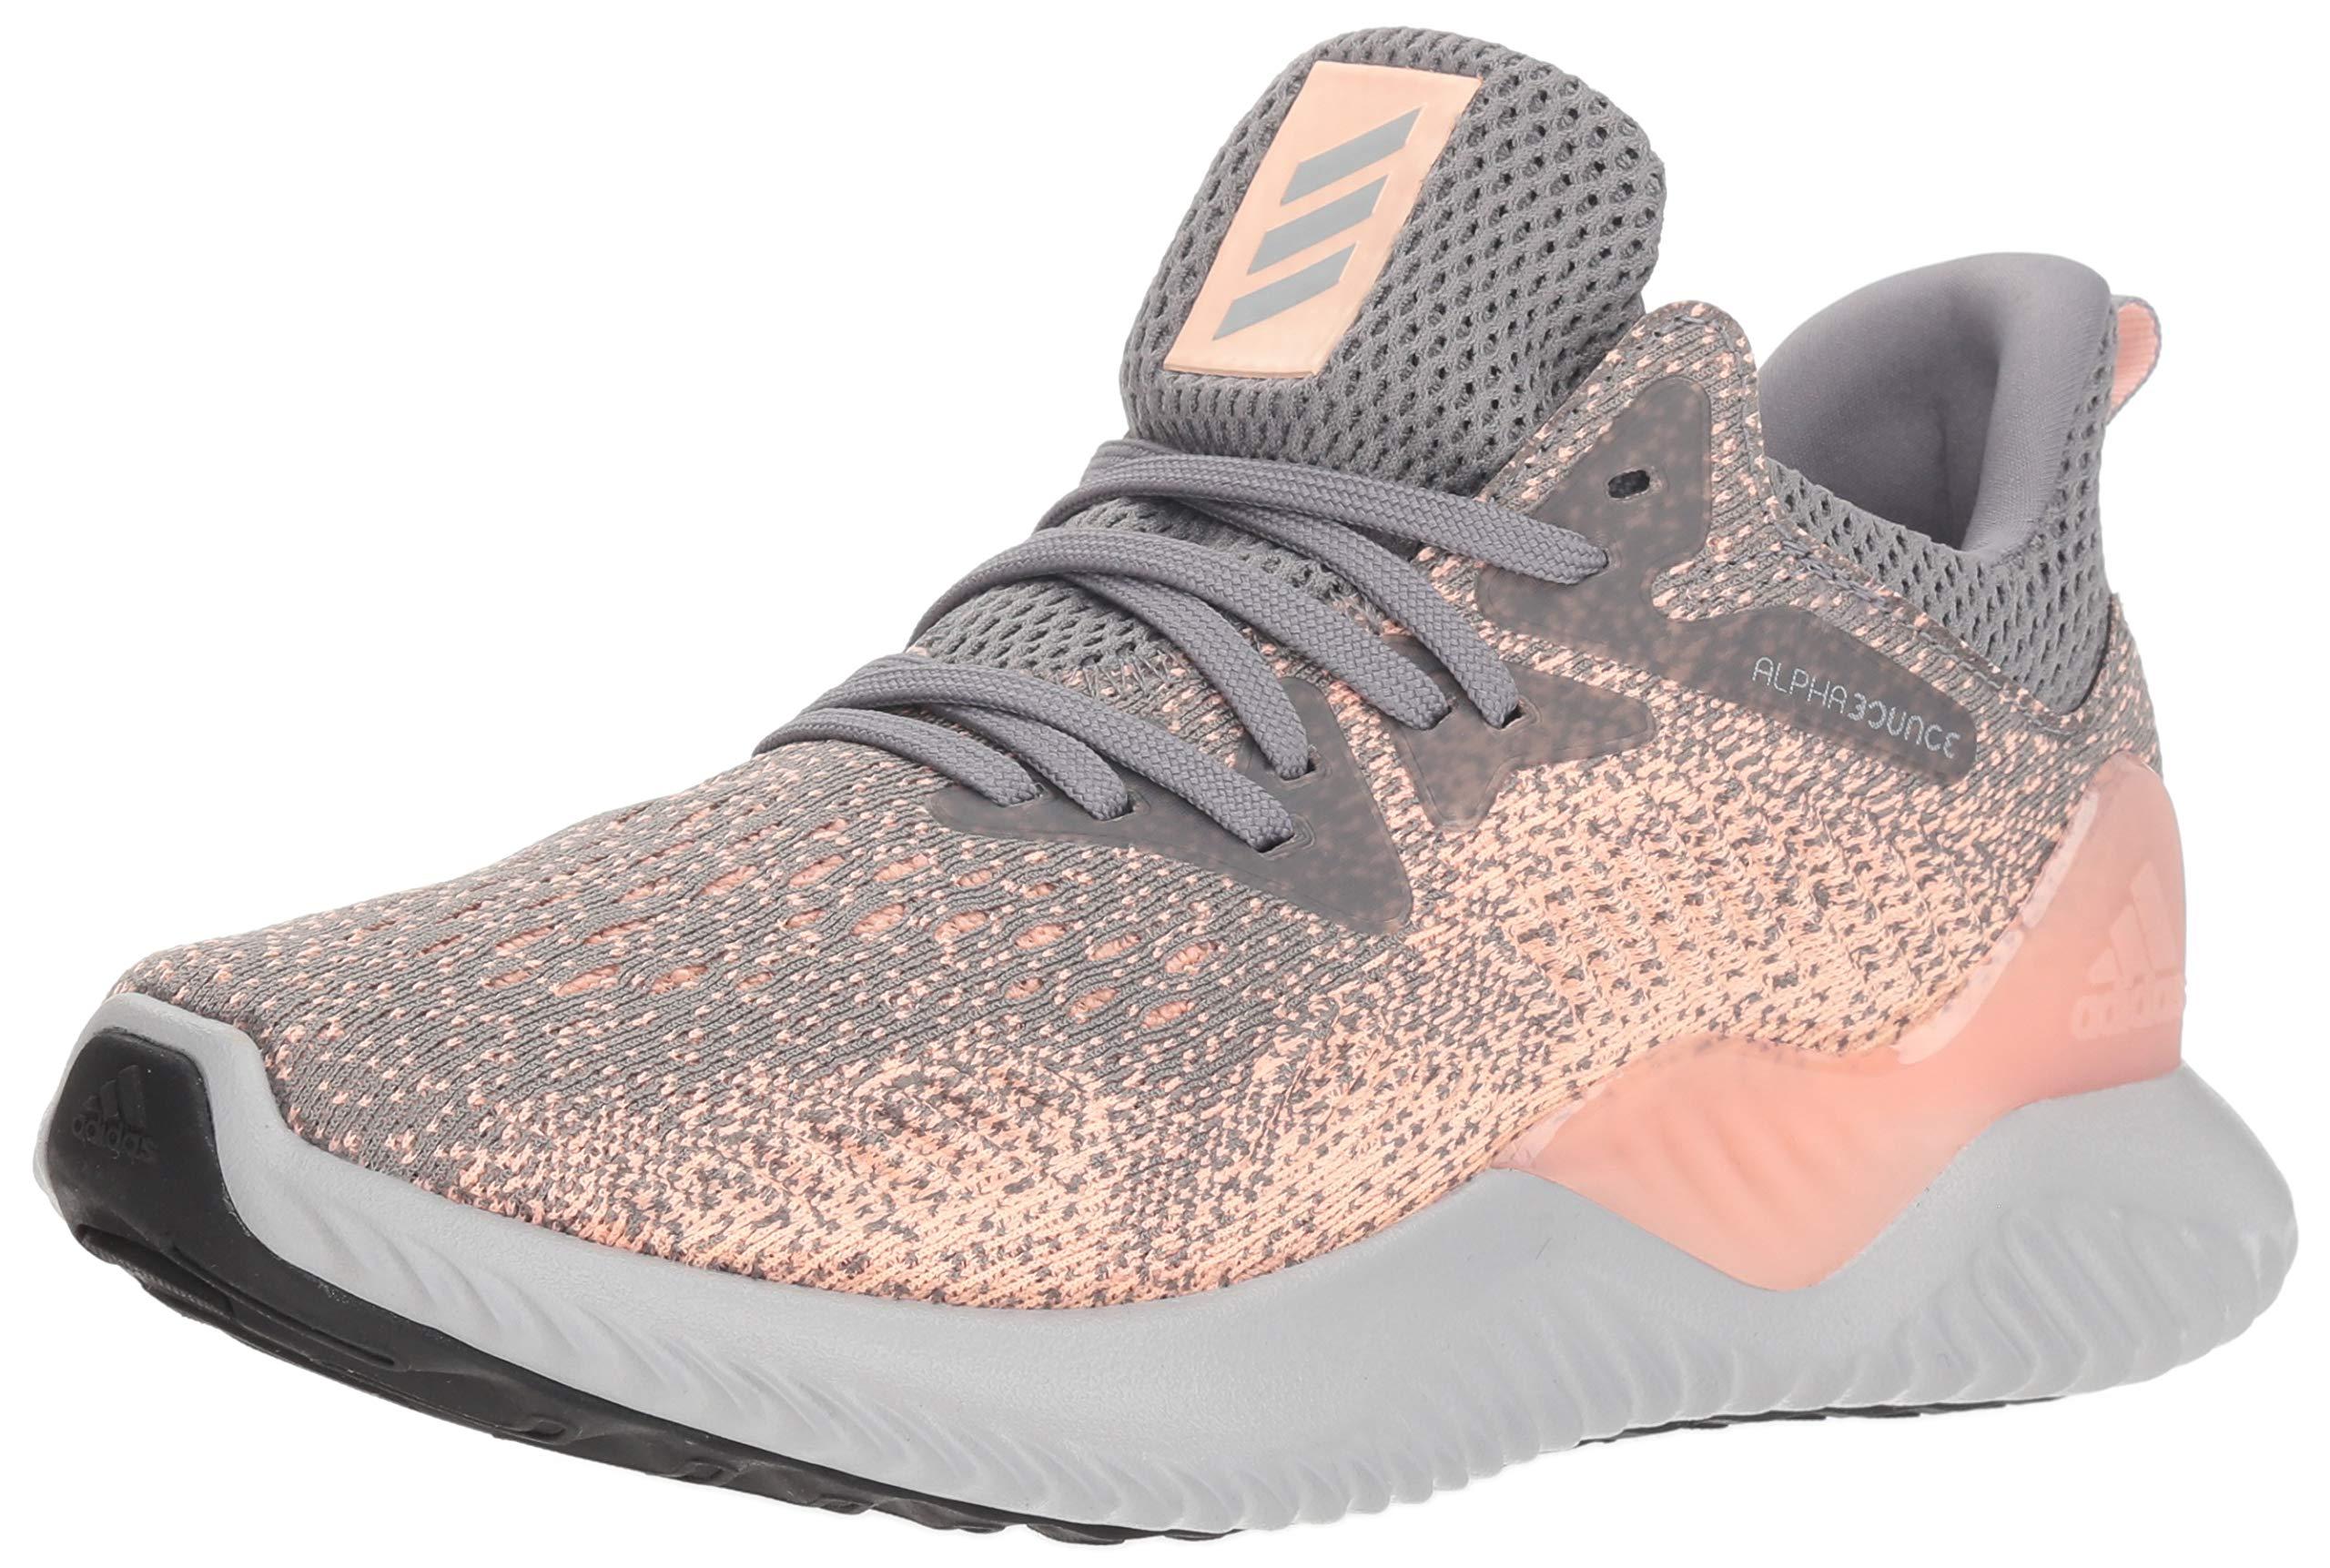 adidas Unisex Alphabounce Beyond Running Shoe Grey/Clear Orange, 5 M US Big Kid